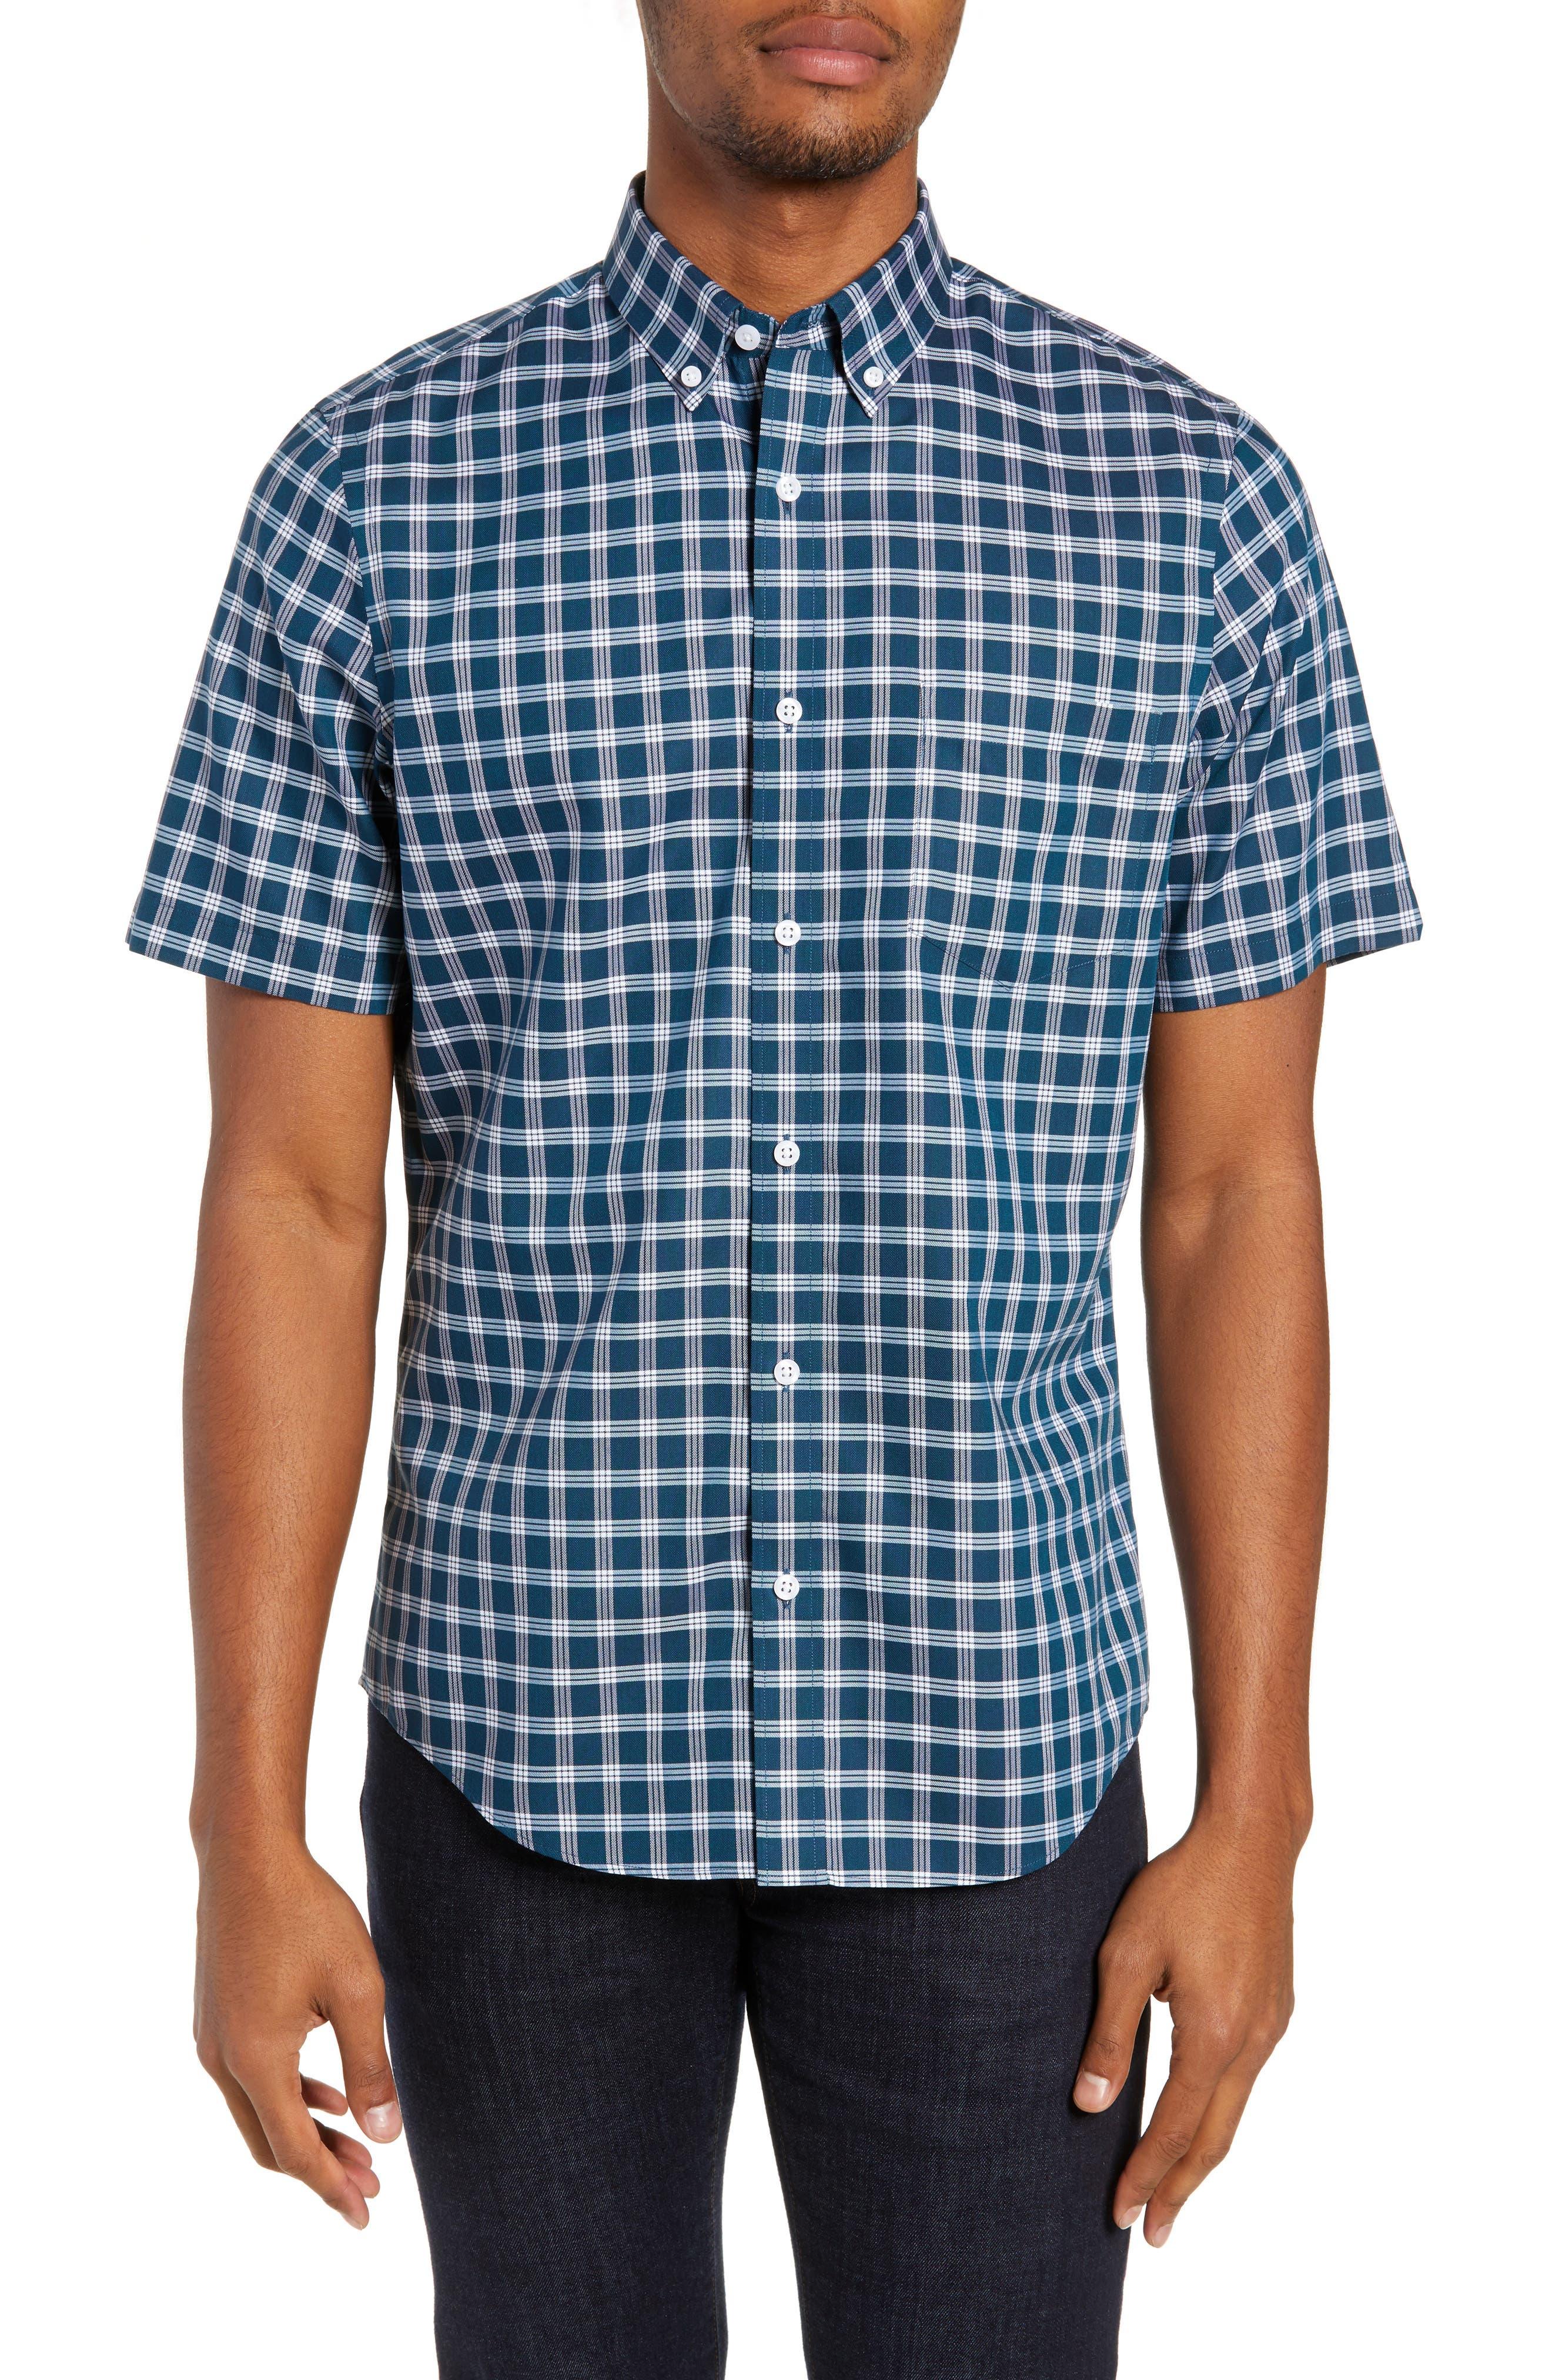 Smartcare<sup>™</sup> Slim Fit Check Sport Shirt,                             Main thumbnail 1, color,                             TEAL GLOSS WHITE CHECK